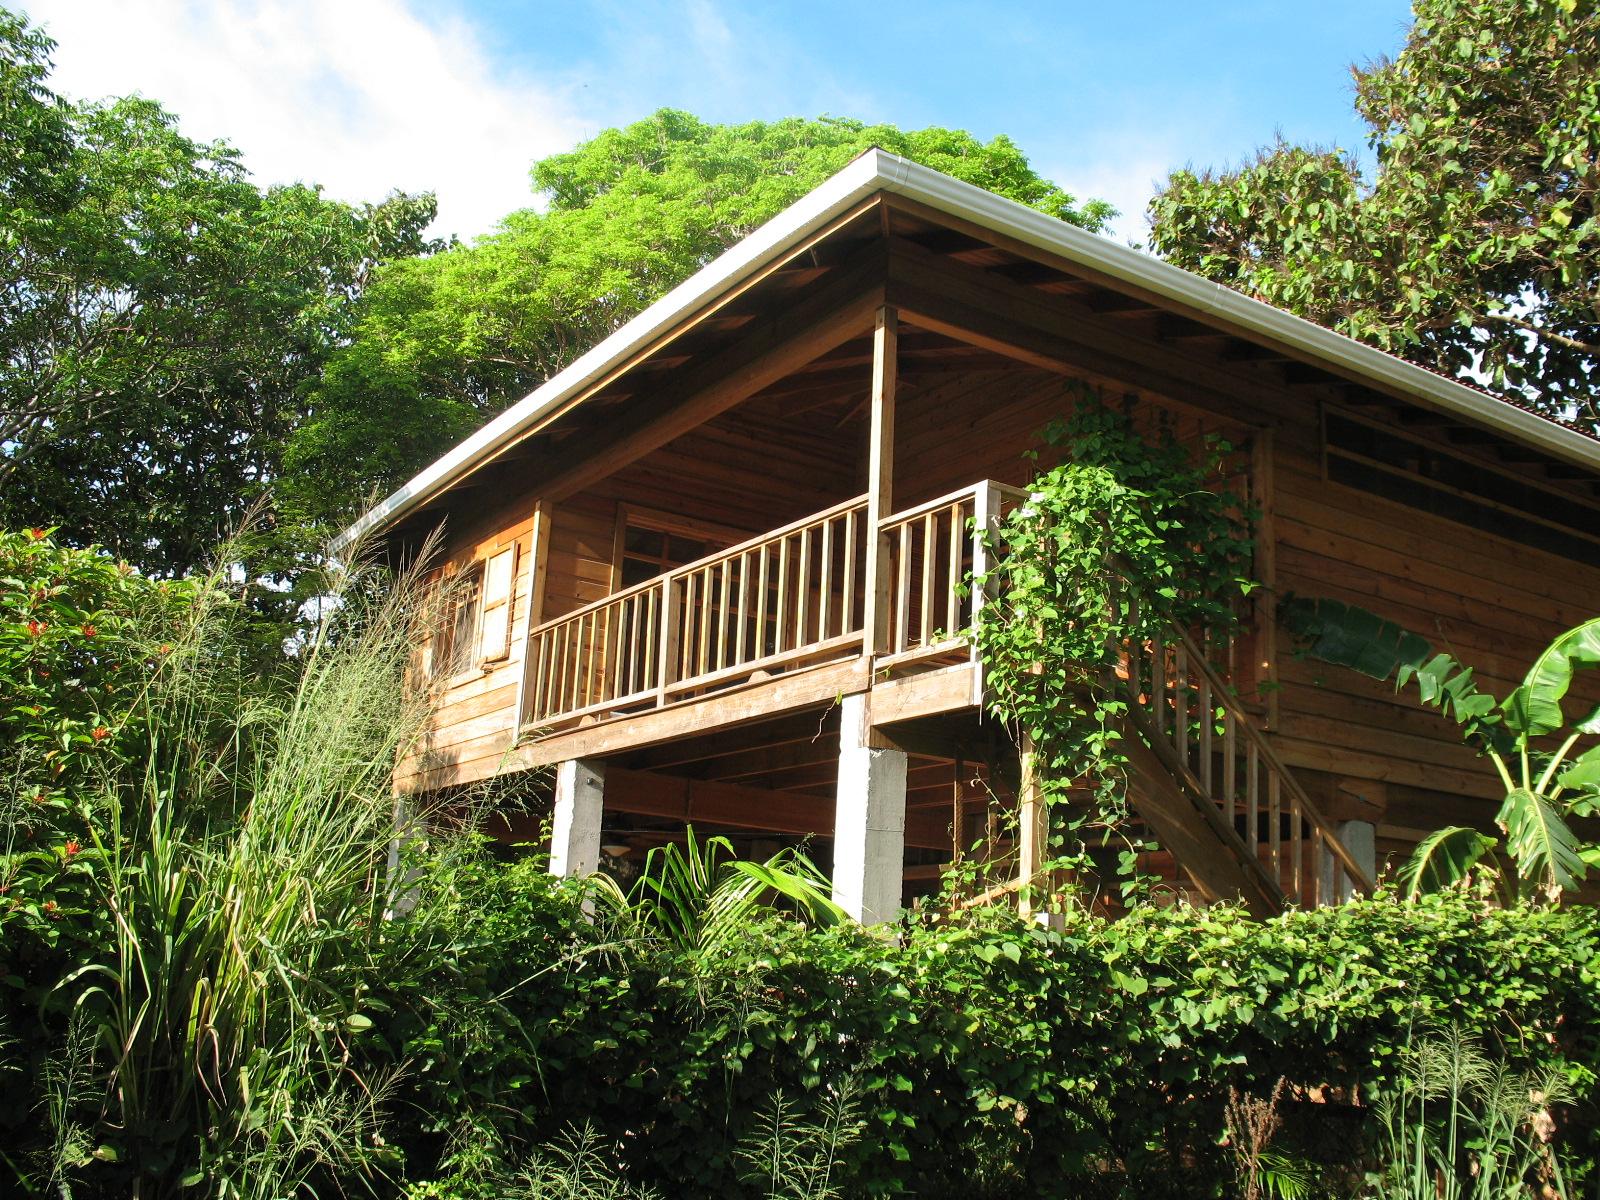 eco-house-vacation-rental-utila-the-bay-islands-honduras-1600x1200